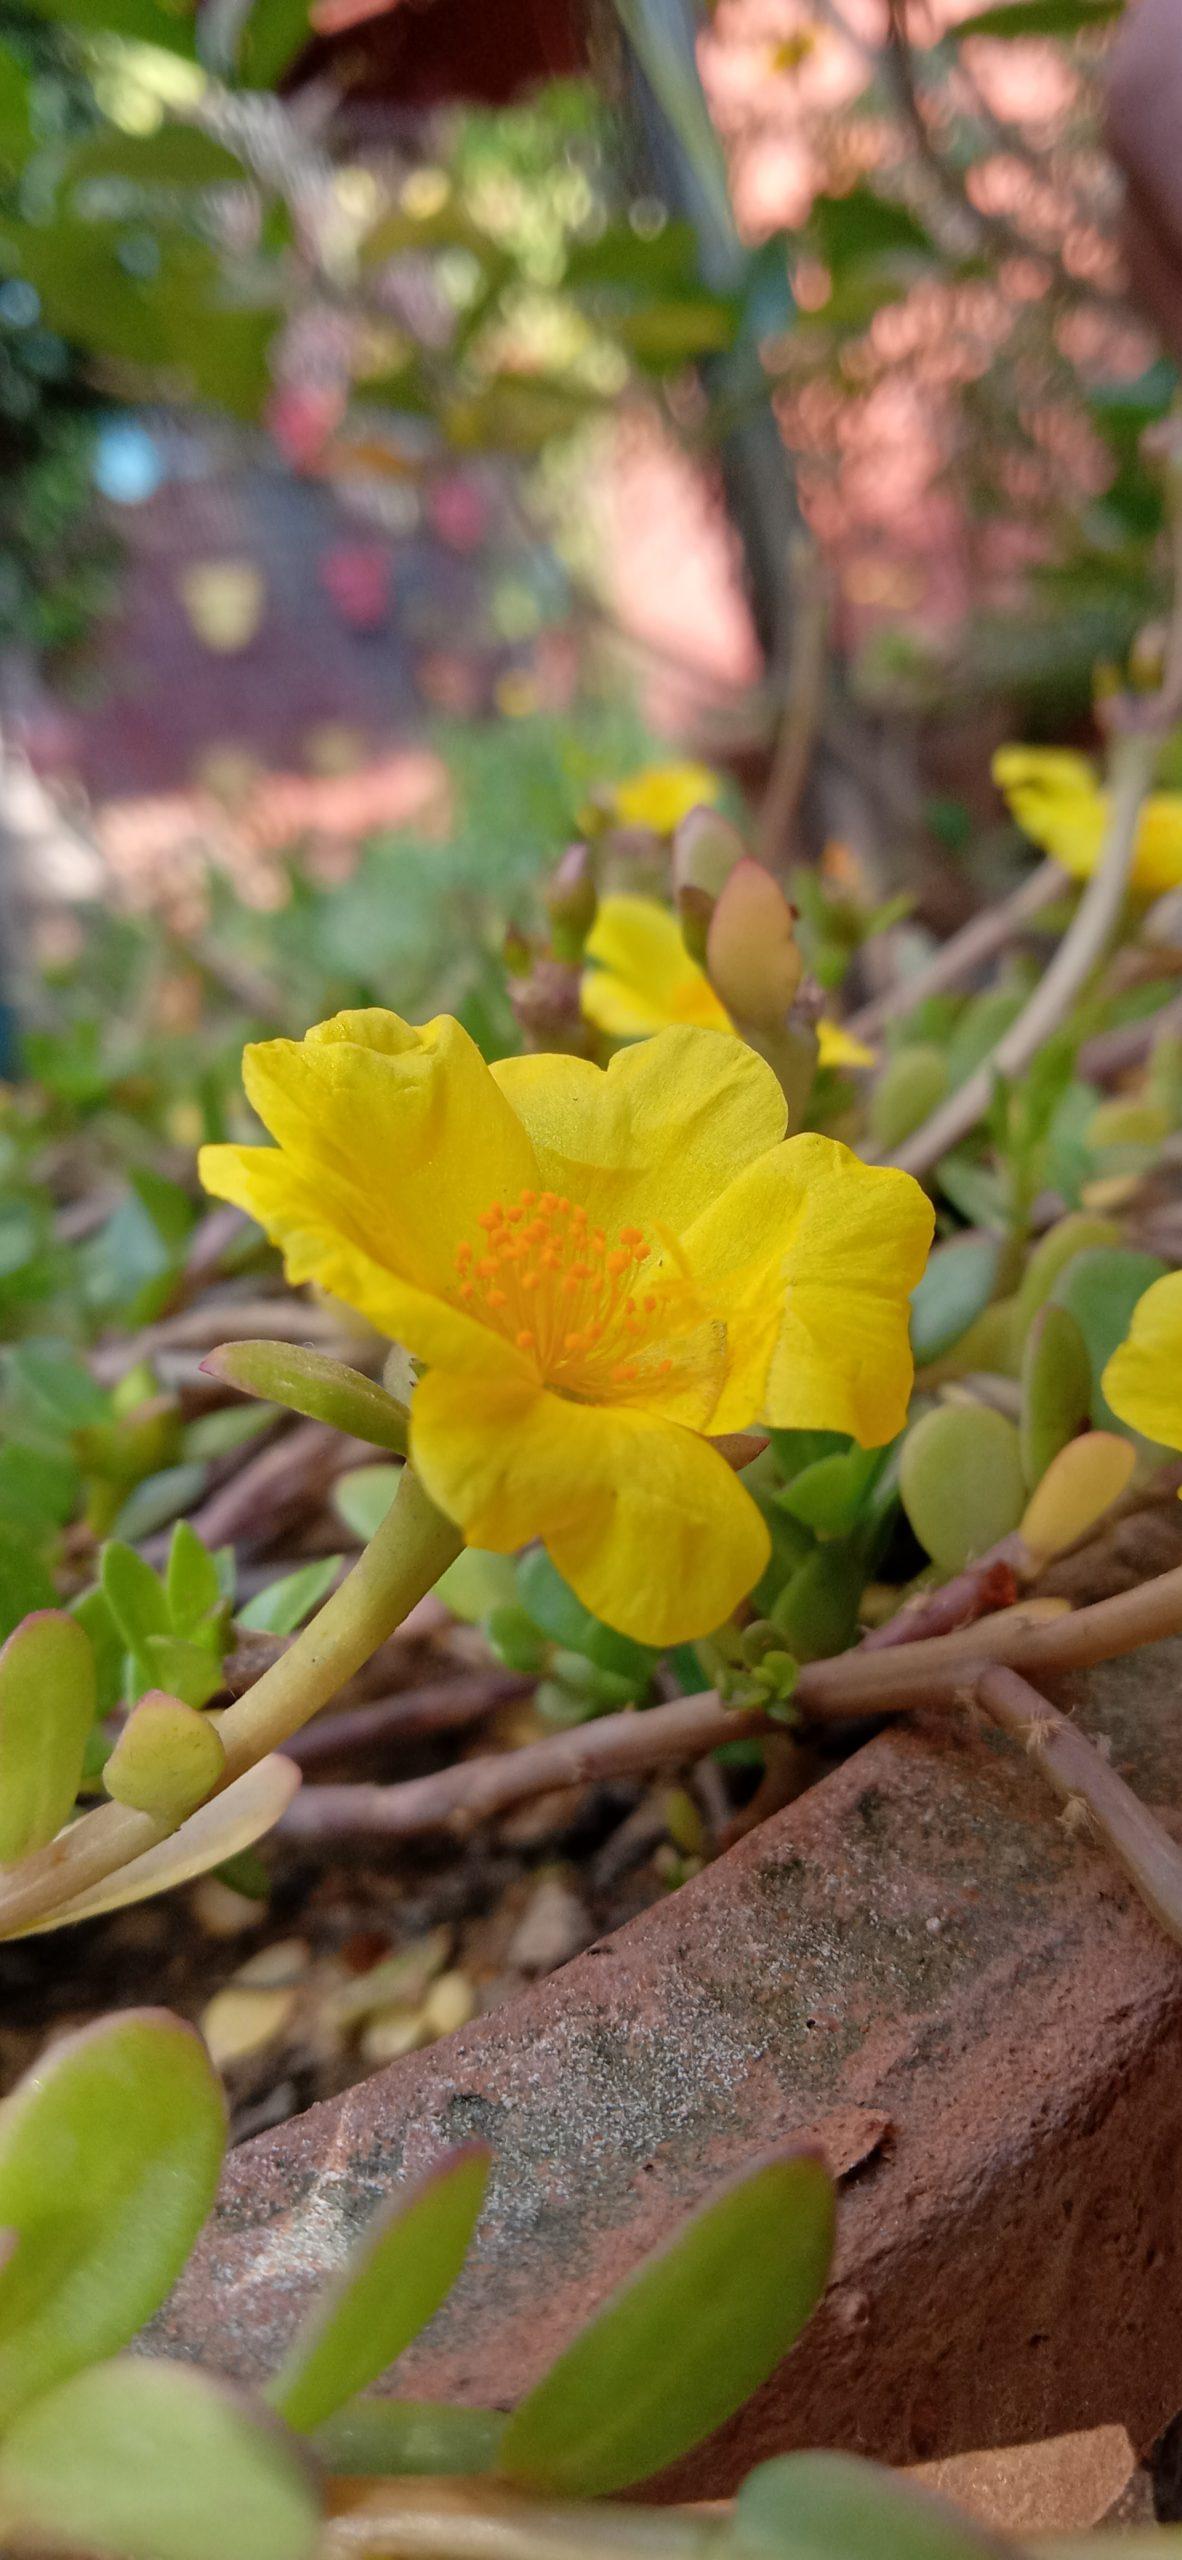 yellow beauty of flower